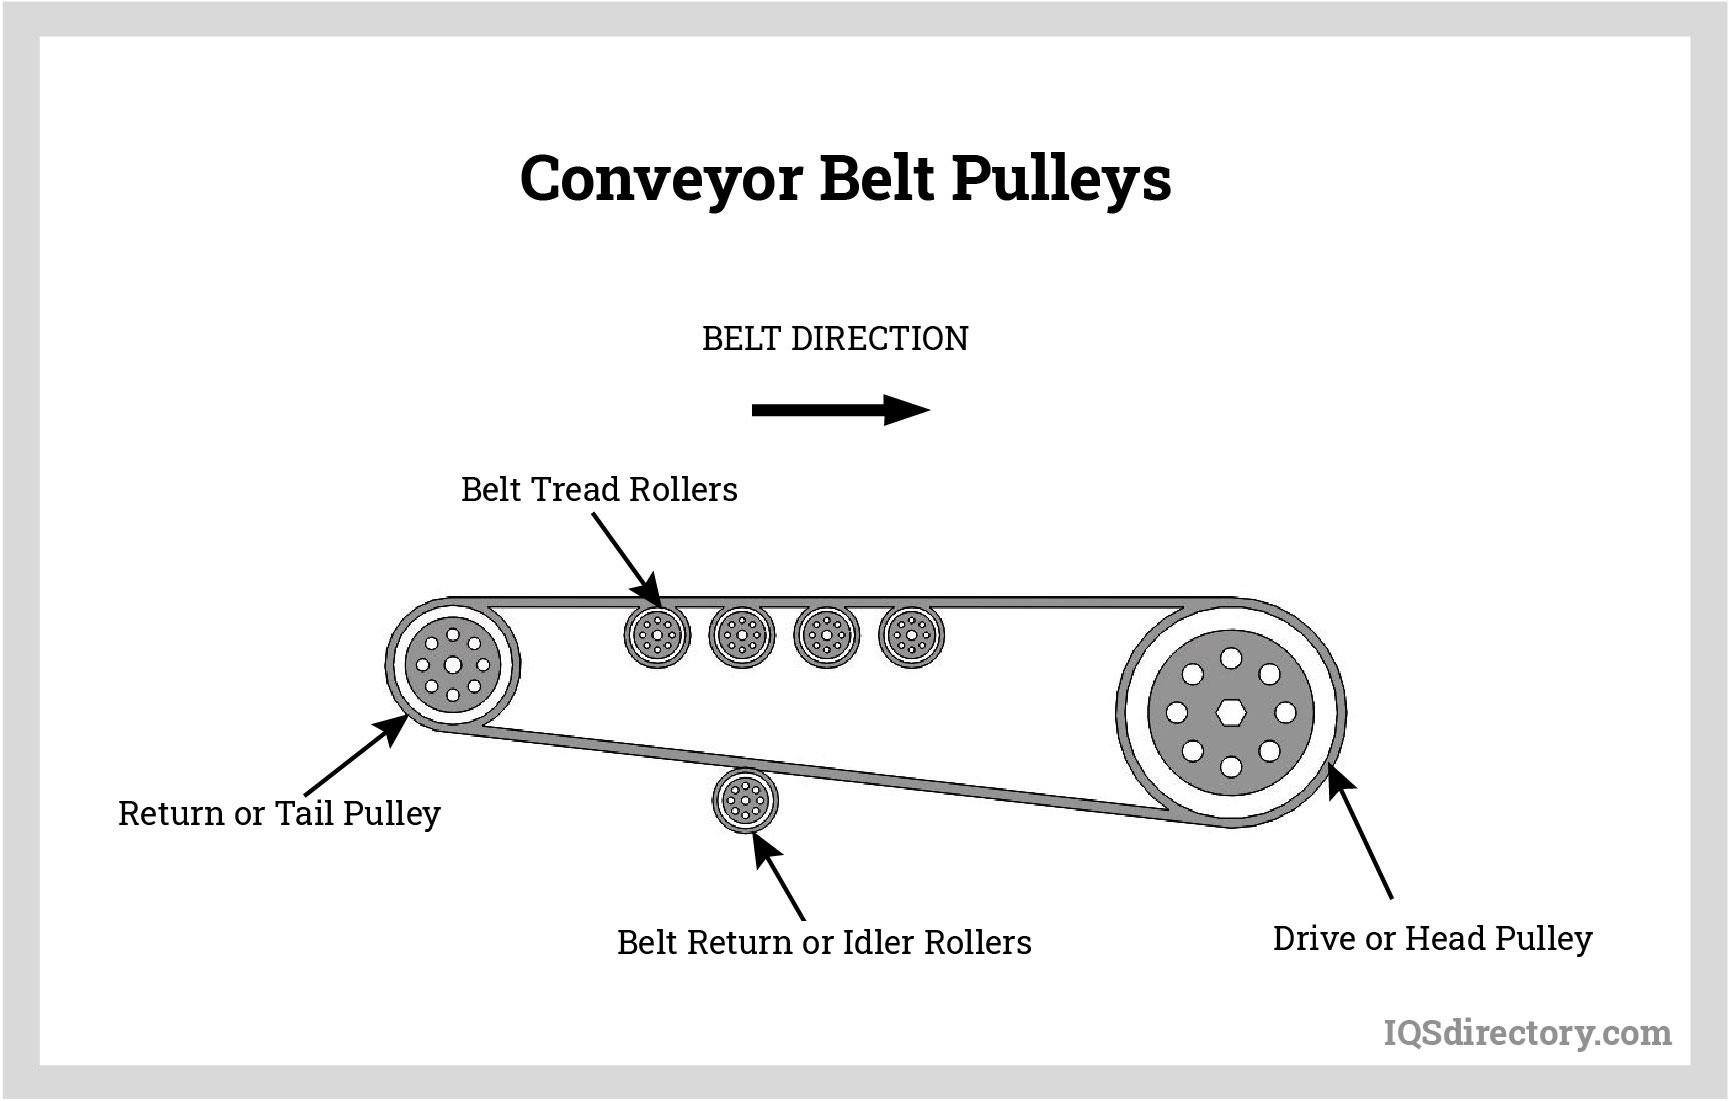 Conveyor Belt Pulleys